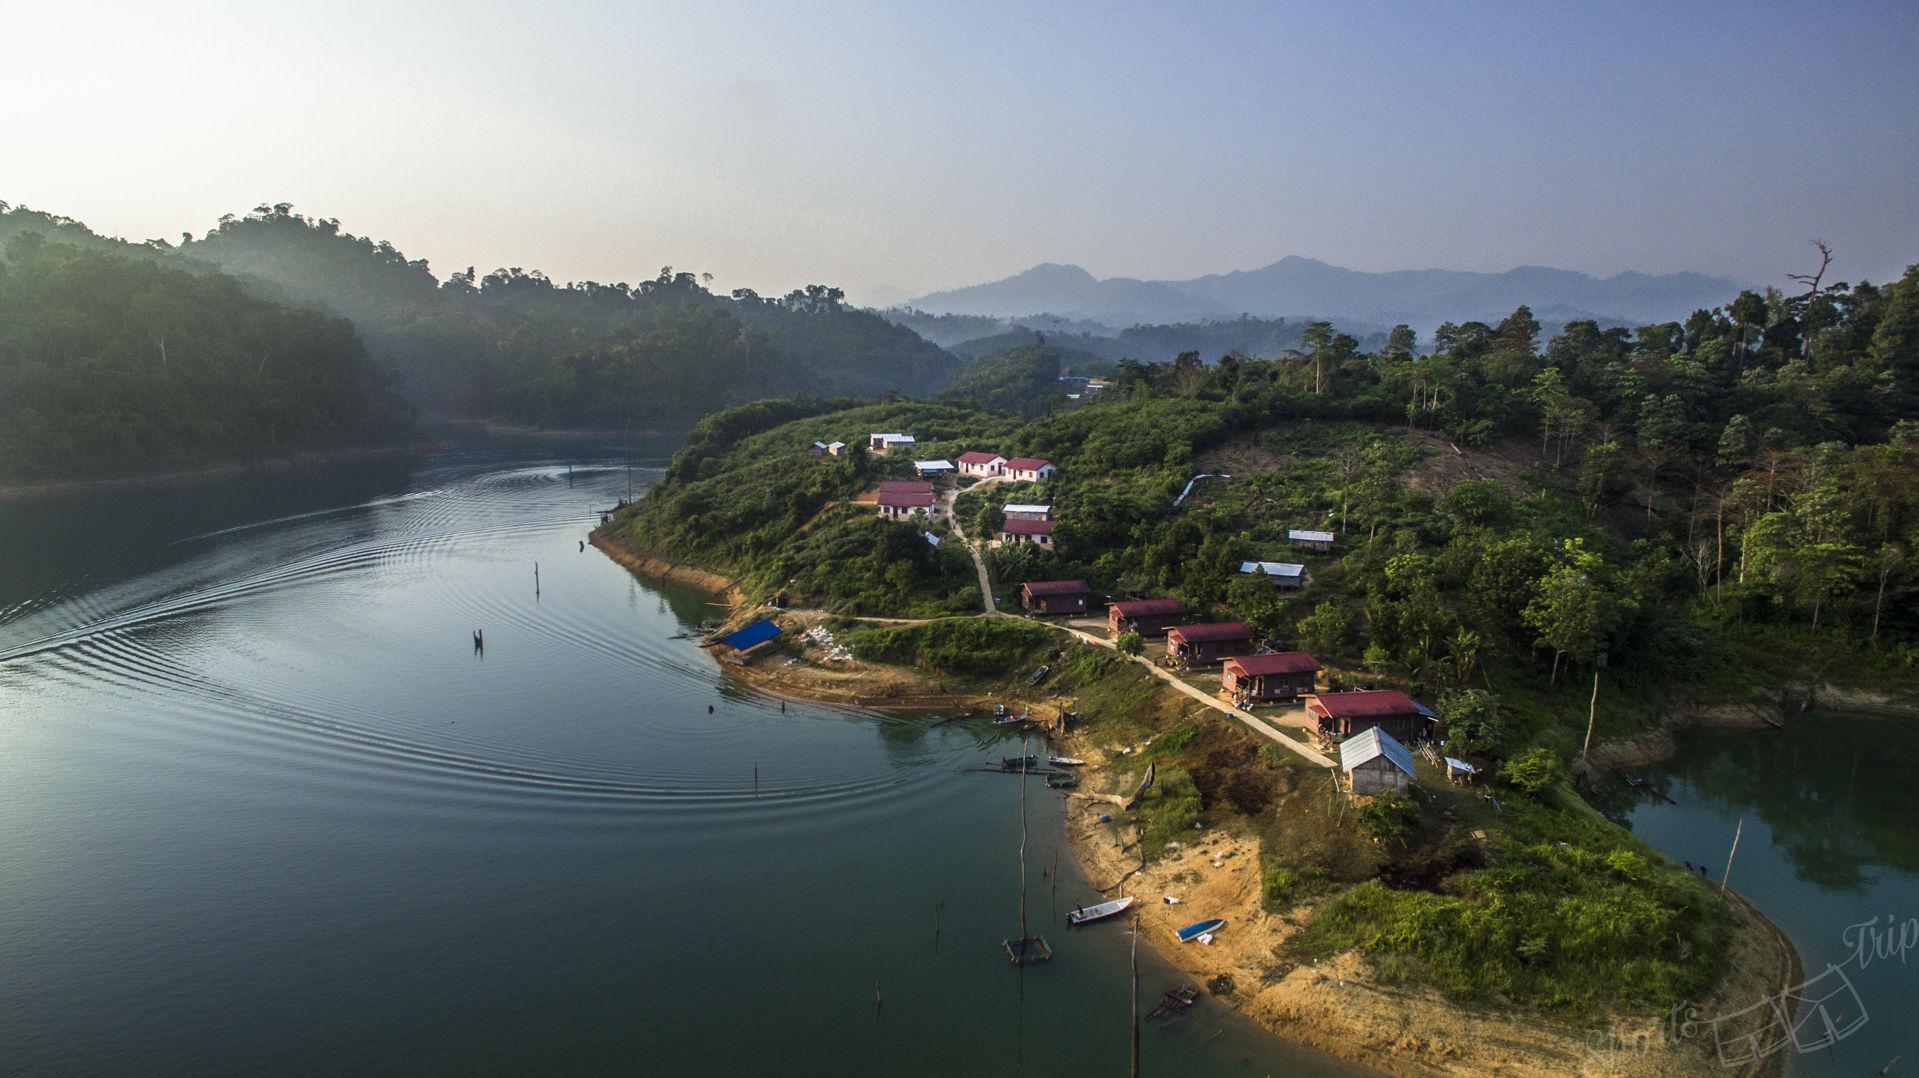 Asli village, aborigine people village, asli malaysia, asli village from drone, asli village aerial